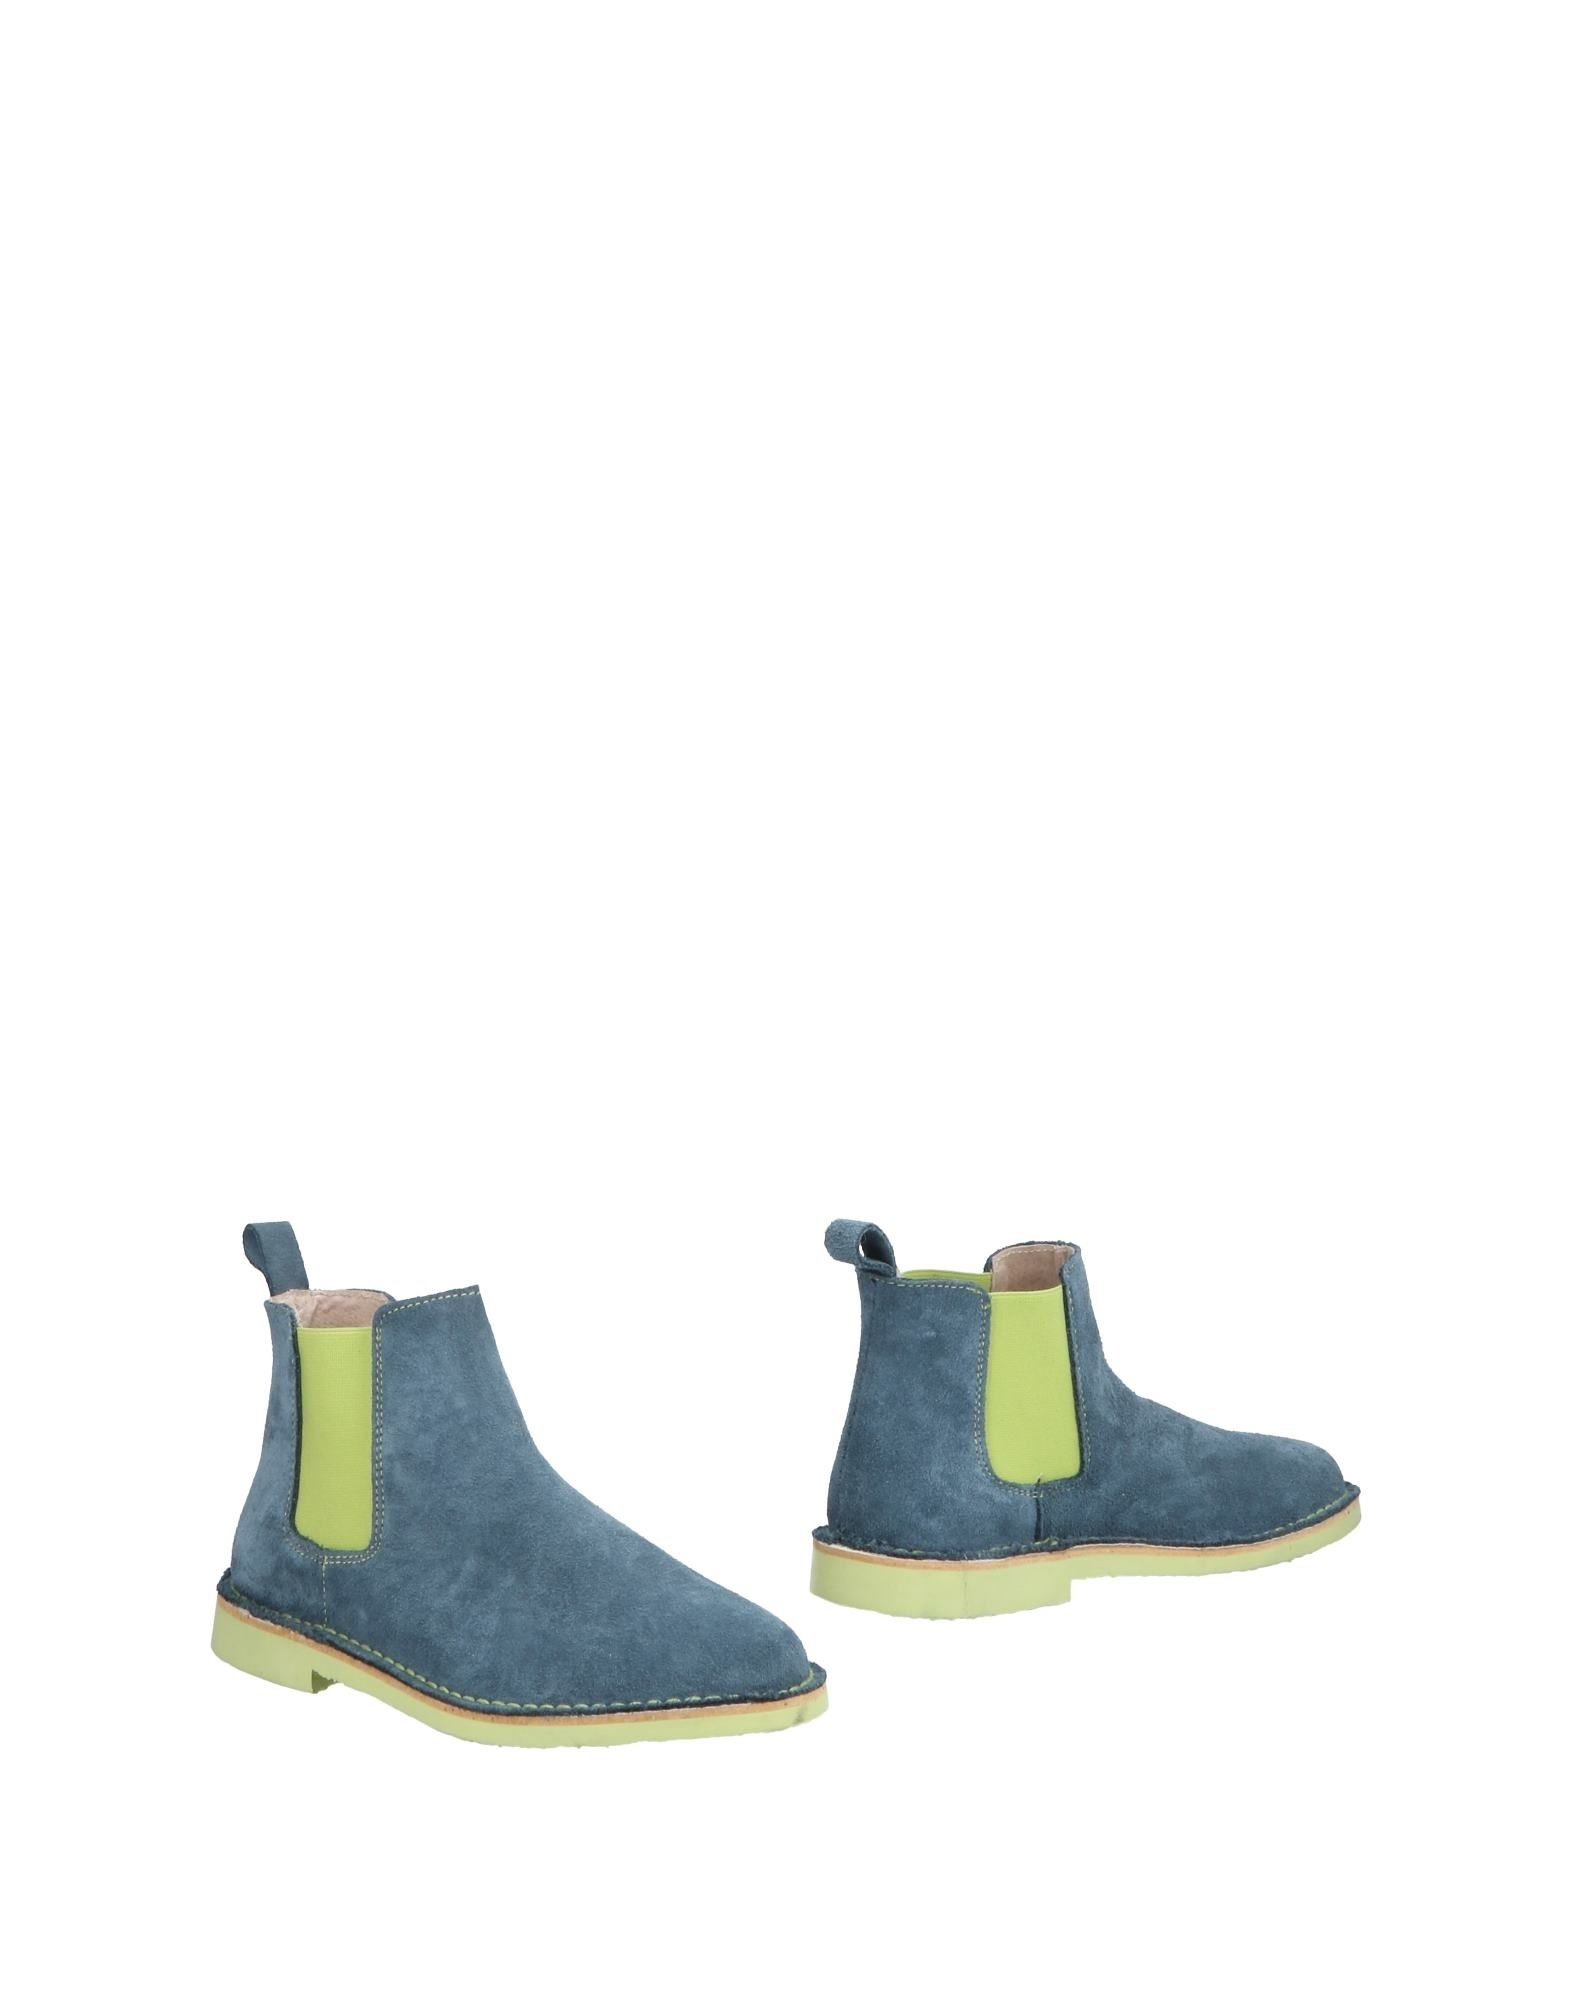 RAQUEL PEREZ® Полусапоги и высокие ботинки casual shoes women office ladies shoes lady cute bow tie pointed toe flats female cute spring